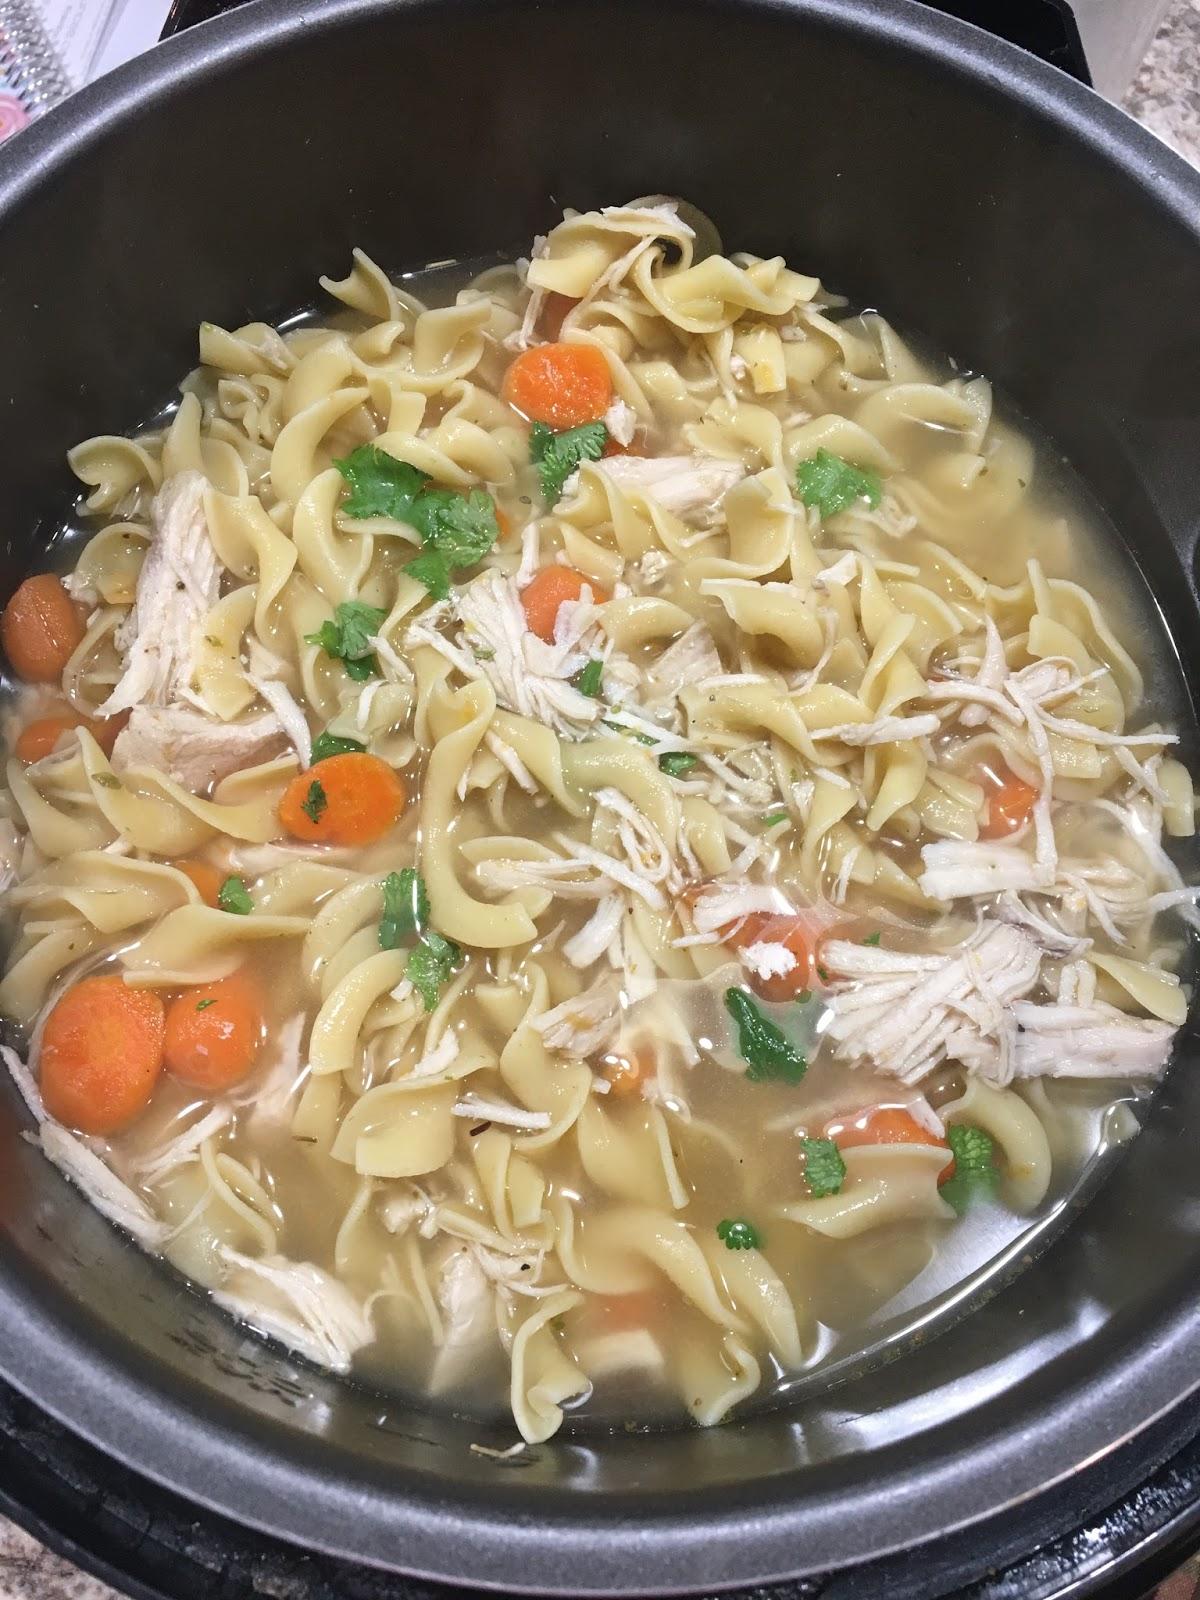 Chasing Saturdays Instant Pot Chicken Noodle Soup